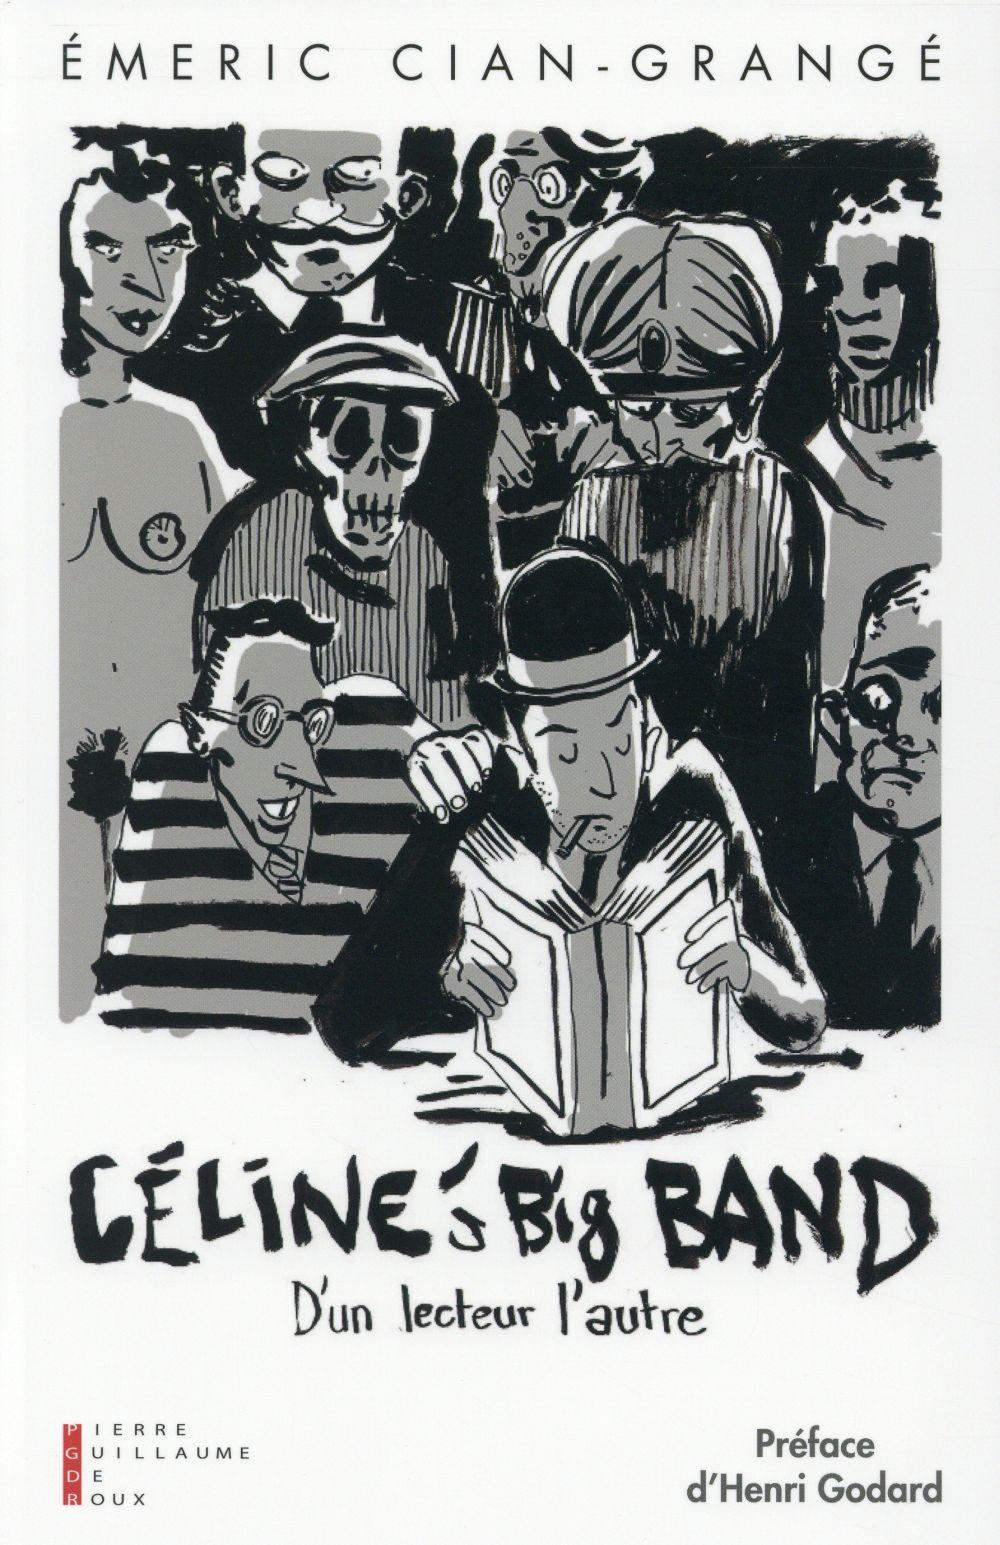 Céline's big band.